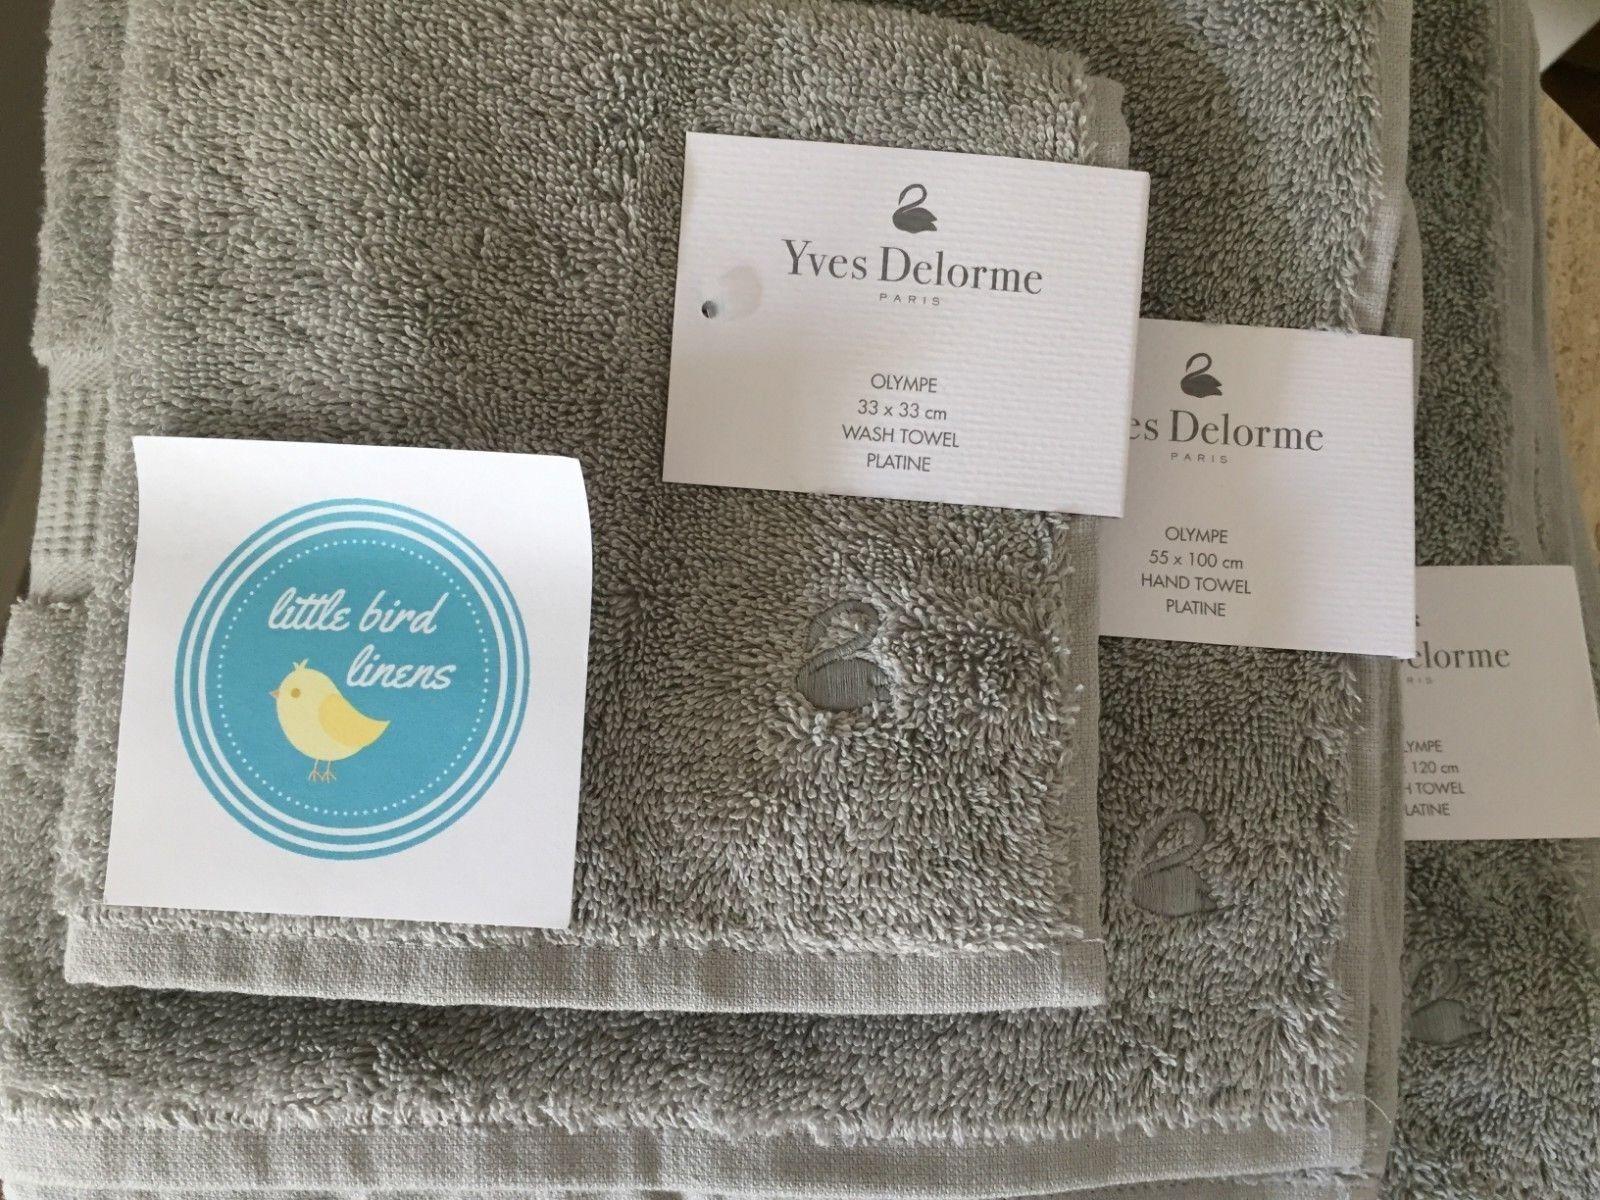 3pc Yves DeLorme Olympe Platine Platinum Towel set- Bath Hand Facecloth-New Rare